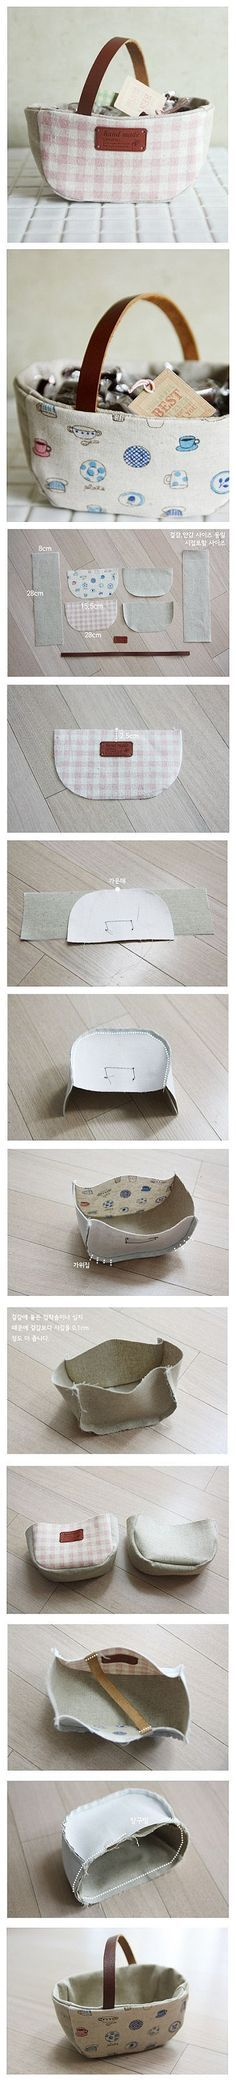 Fabric basket tutorial.